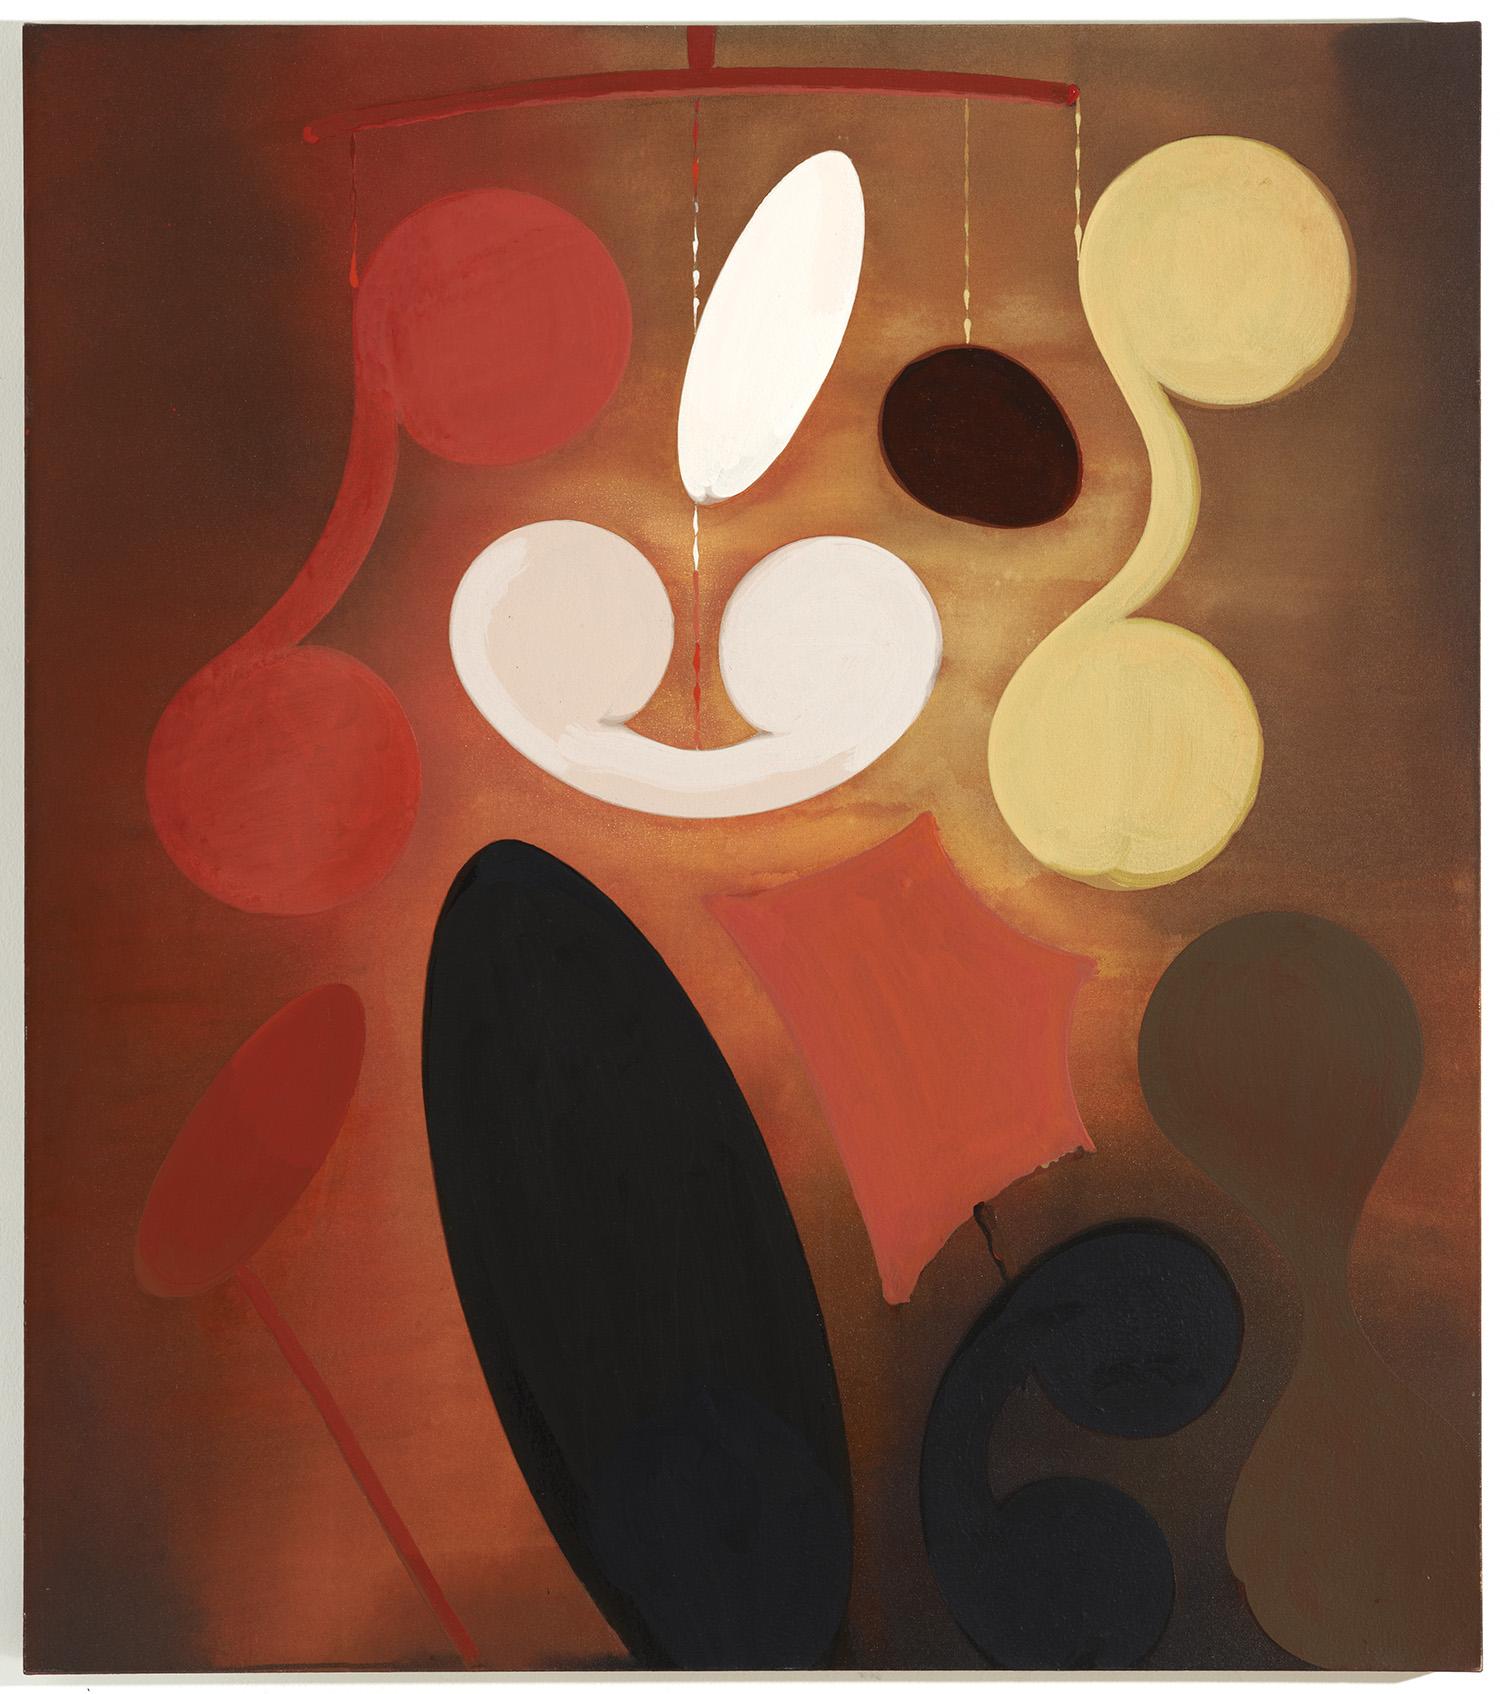 The Third Drink | 1992 | Acryl auf Leinwand | 133 x 117 cm